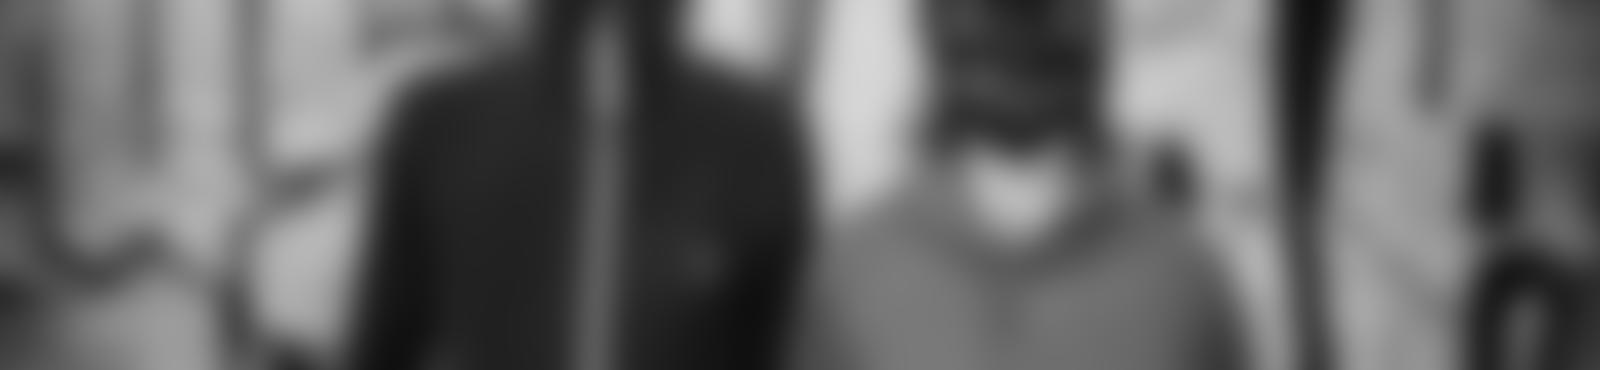 Blurred 6d6ce1fe 8960 47d6 888c 5788f6a2ccaa